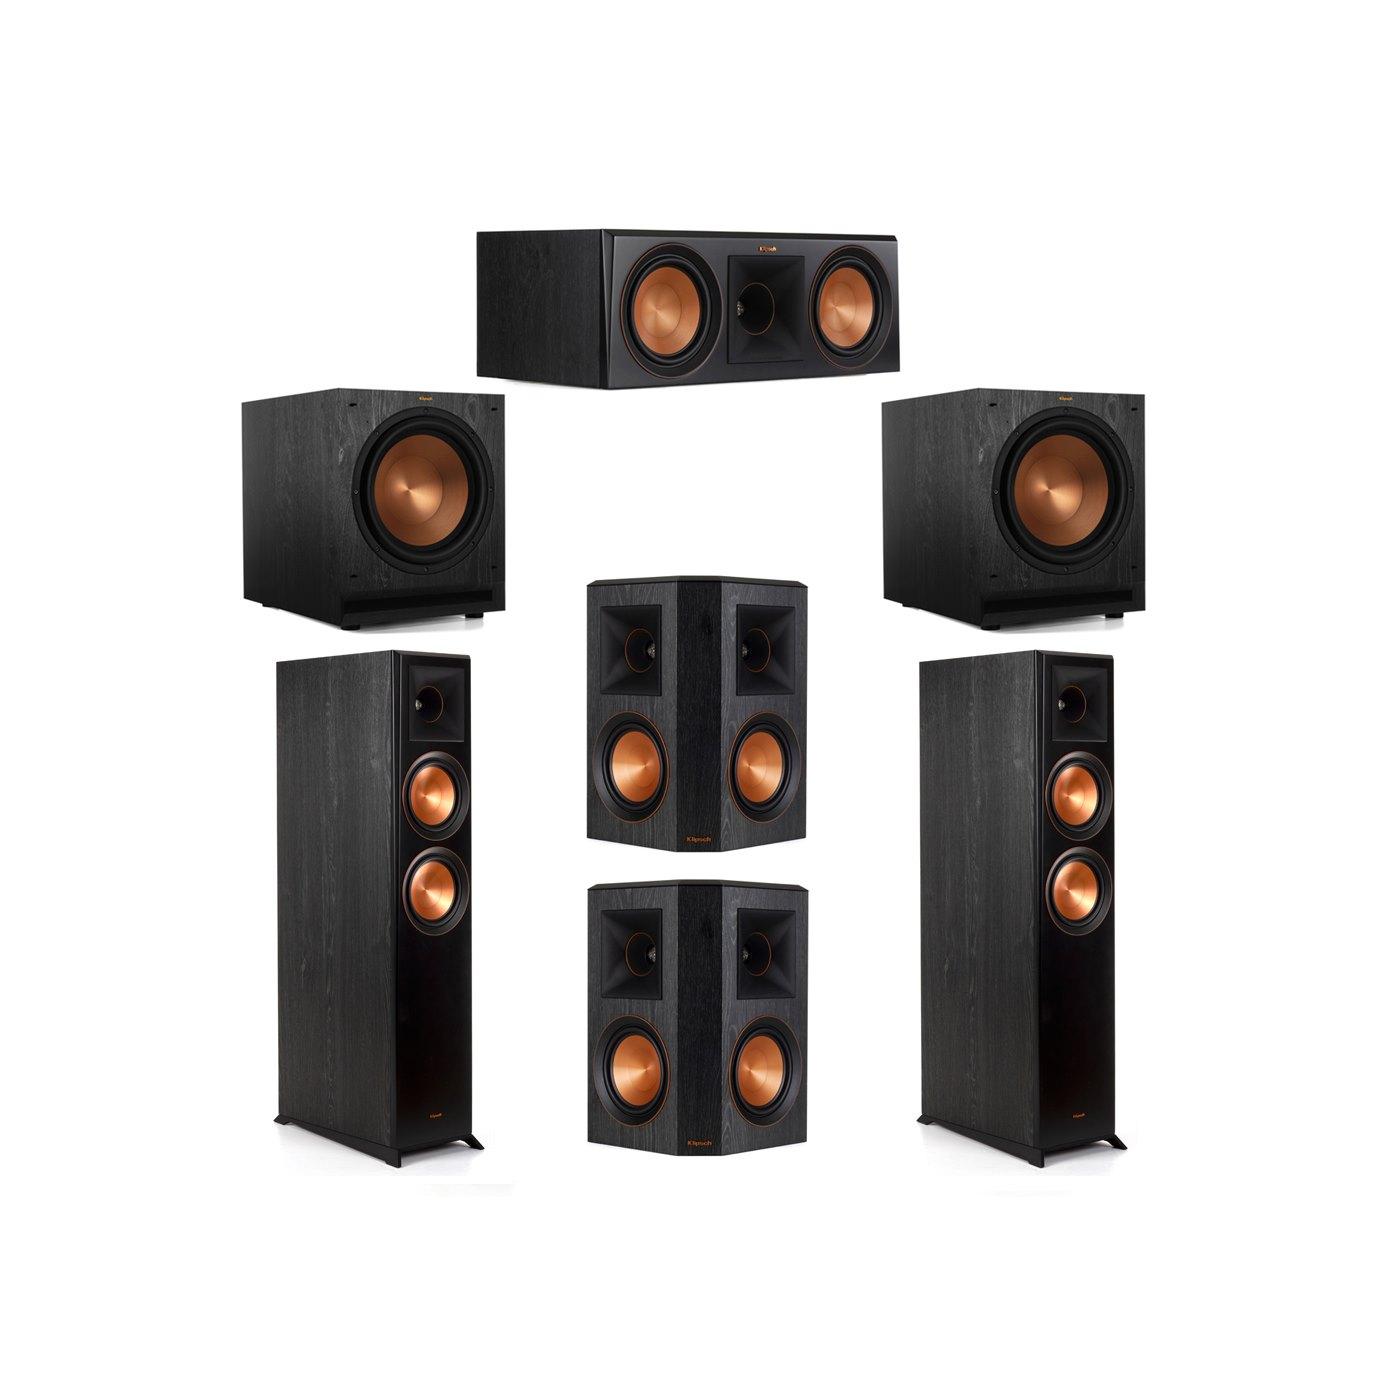 Klipsch 5.2 System with 2 RP-6000F Floorstanding Speakers, 1 Klipsch RP-600C Center Speaker, 2 Klipsch RP-502S Surround Speakers, 2 Klipsch SPL-120 Subwoofers